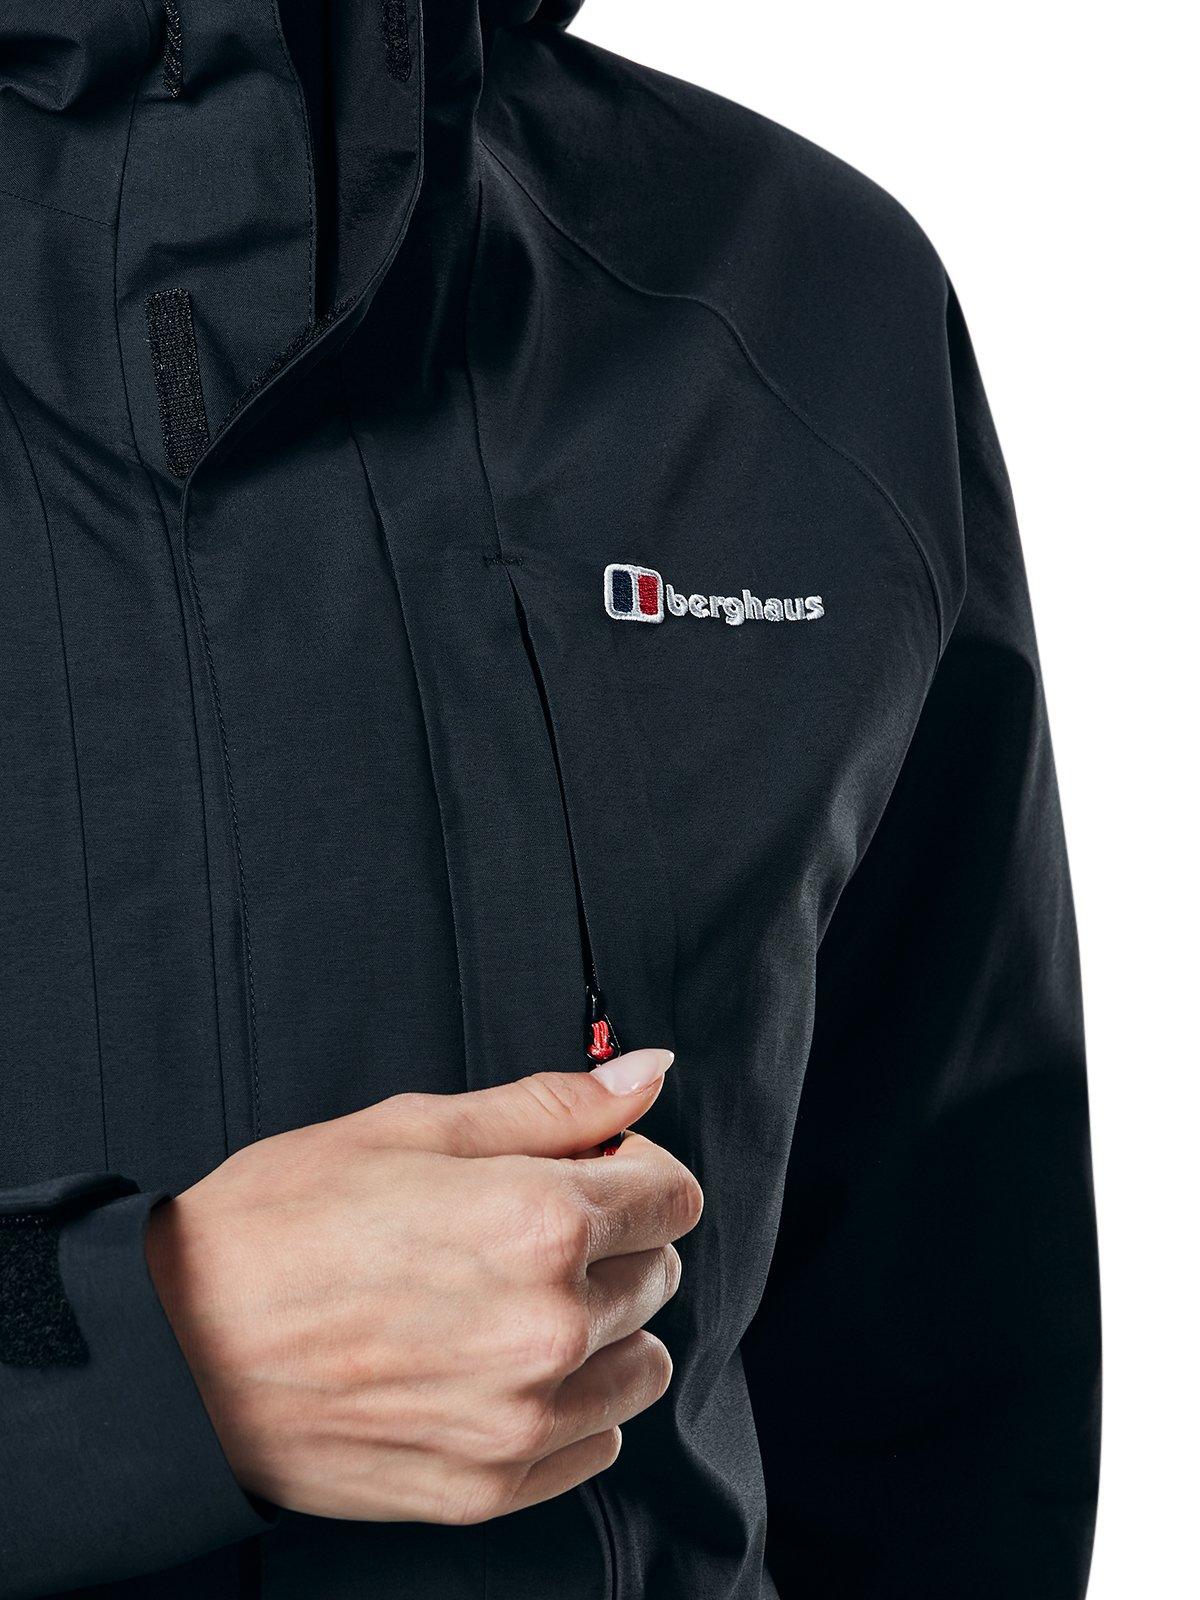 81THTPGbduL - Berghaus Women's Hillmaster Gore-tex Waterproof Jacket